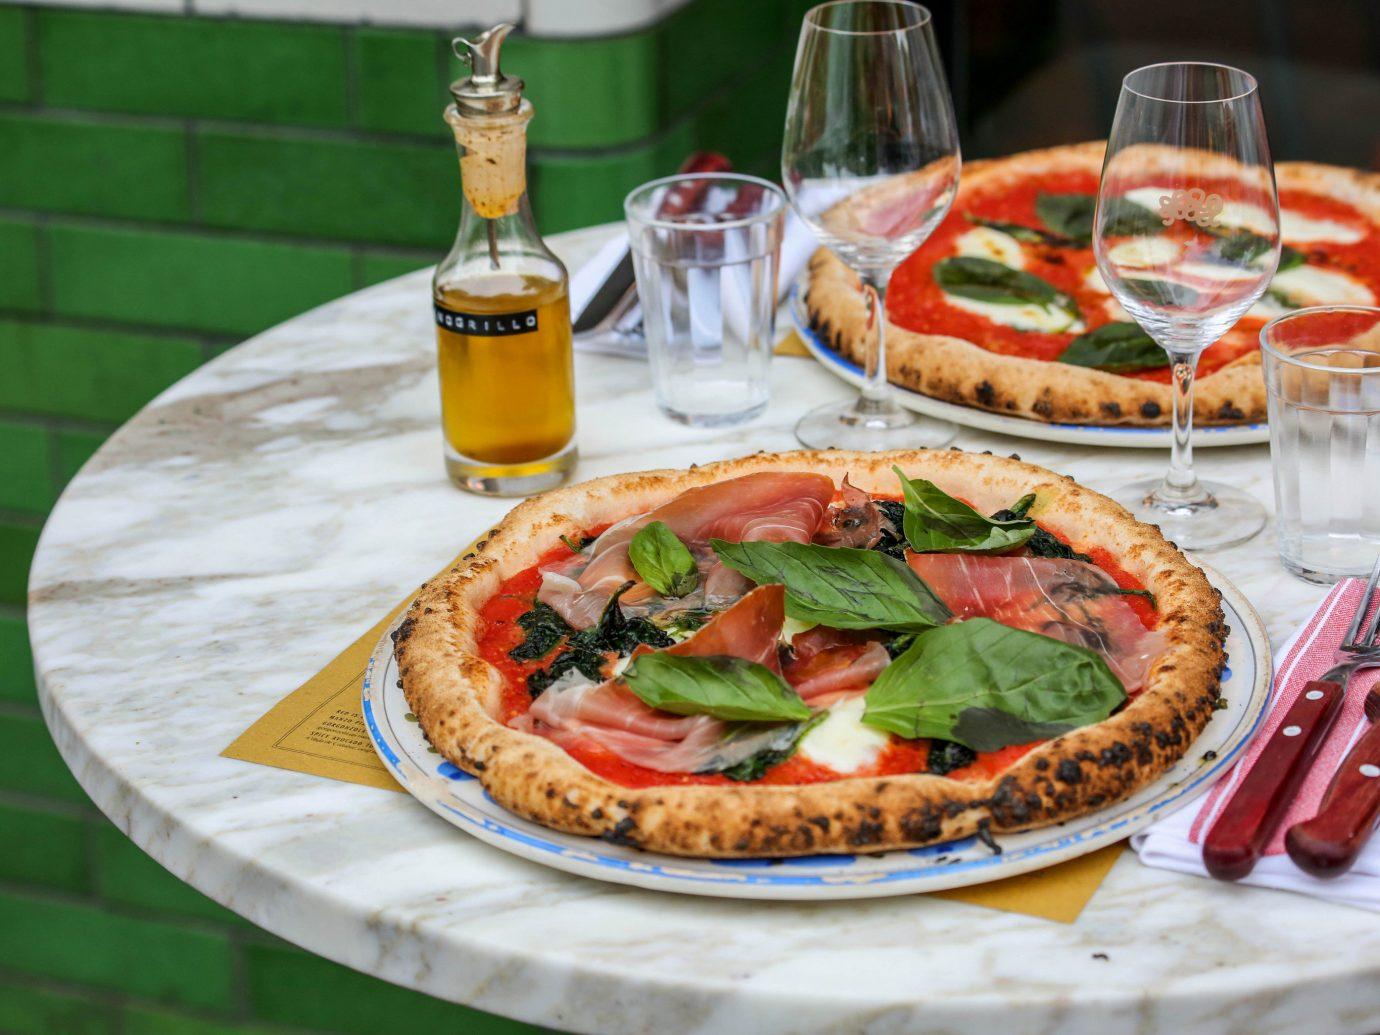 France Paris Trip Ideas food dish plate pizza cuisine meal italian food restaurant breakfast european food supper lunch